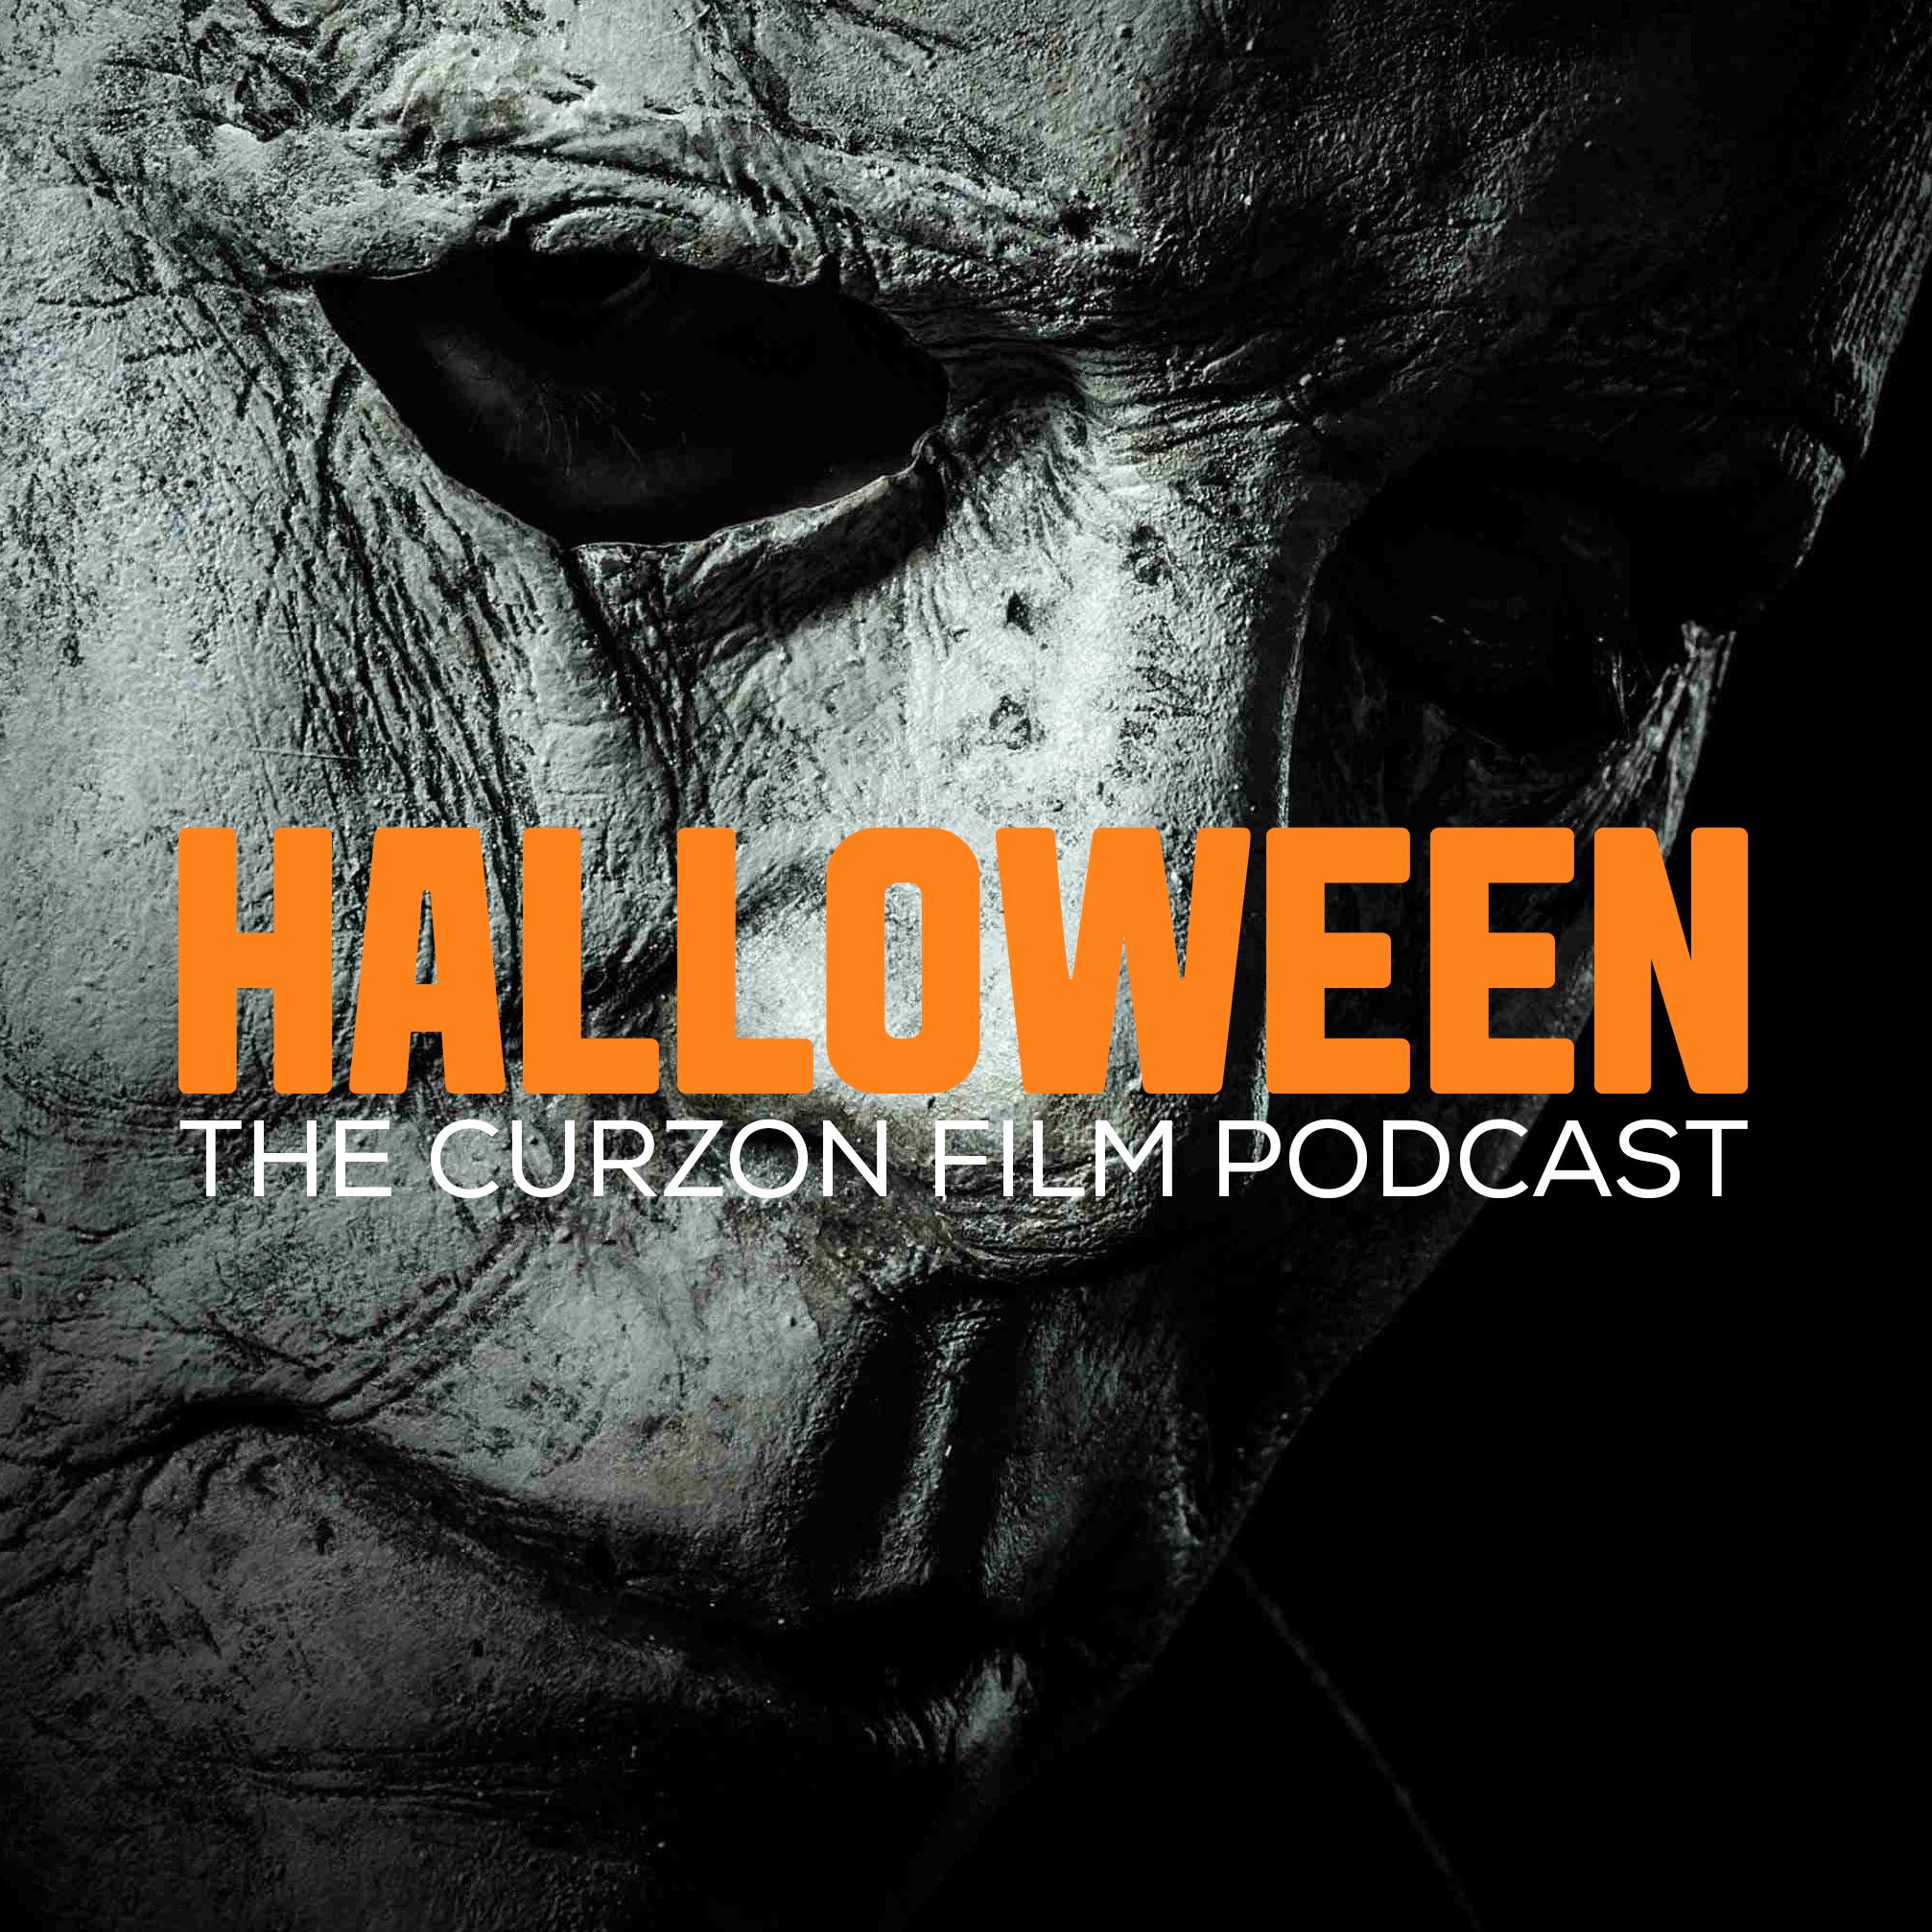 halloween | the curzon film podcast on acast